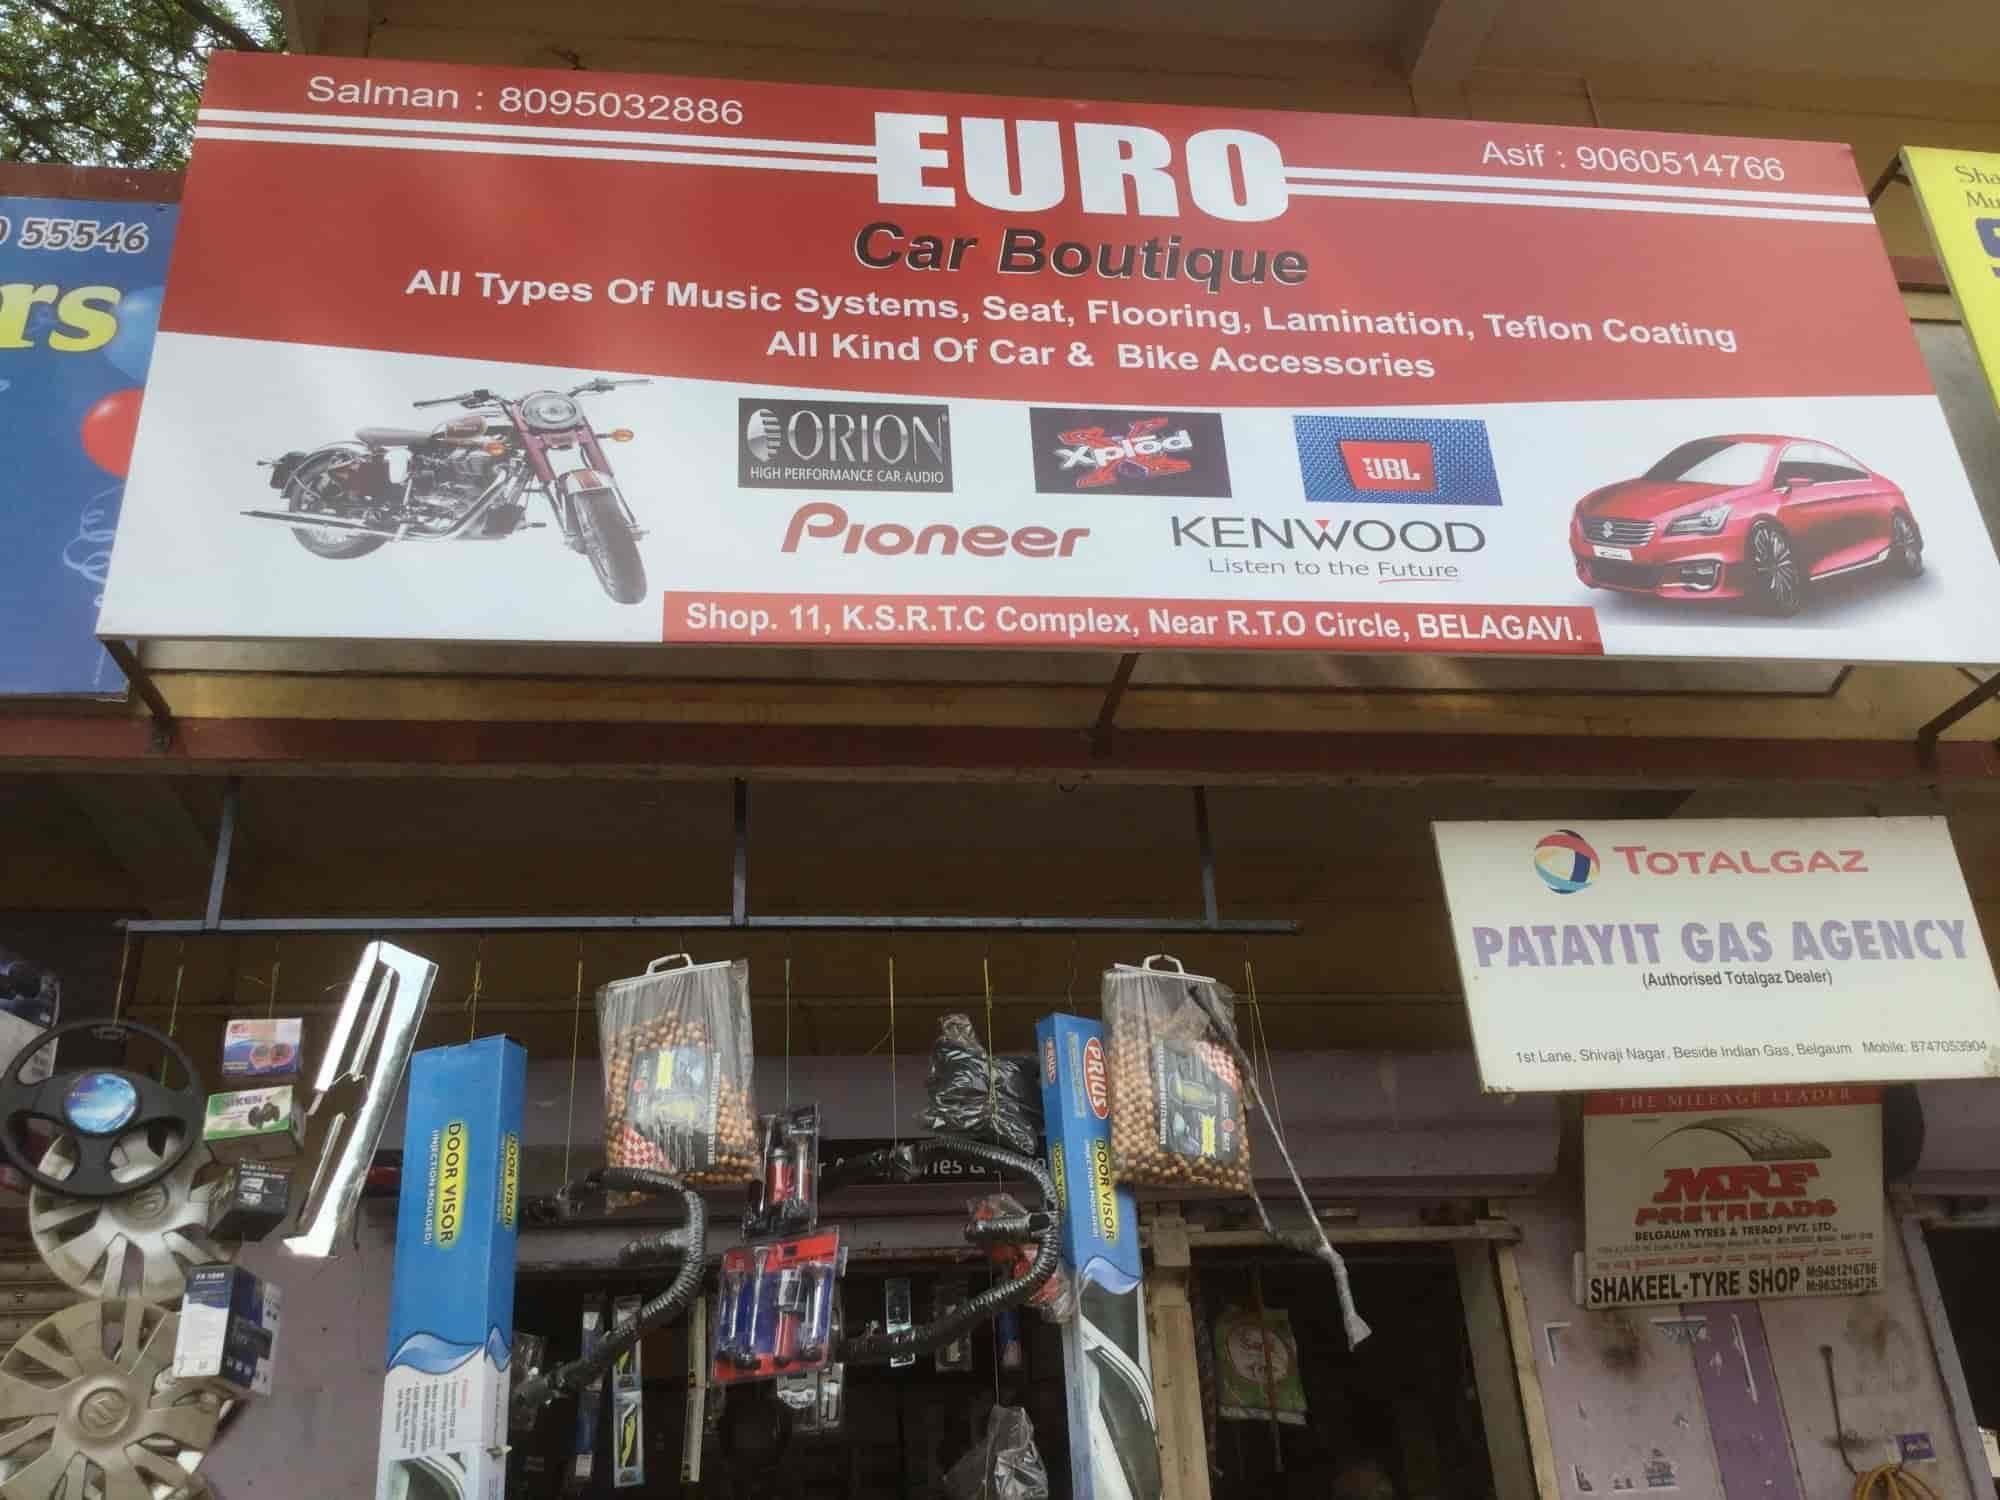 Euro Car Boutique Photos Shivaji Nagar Belgaum Pictures Images